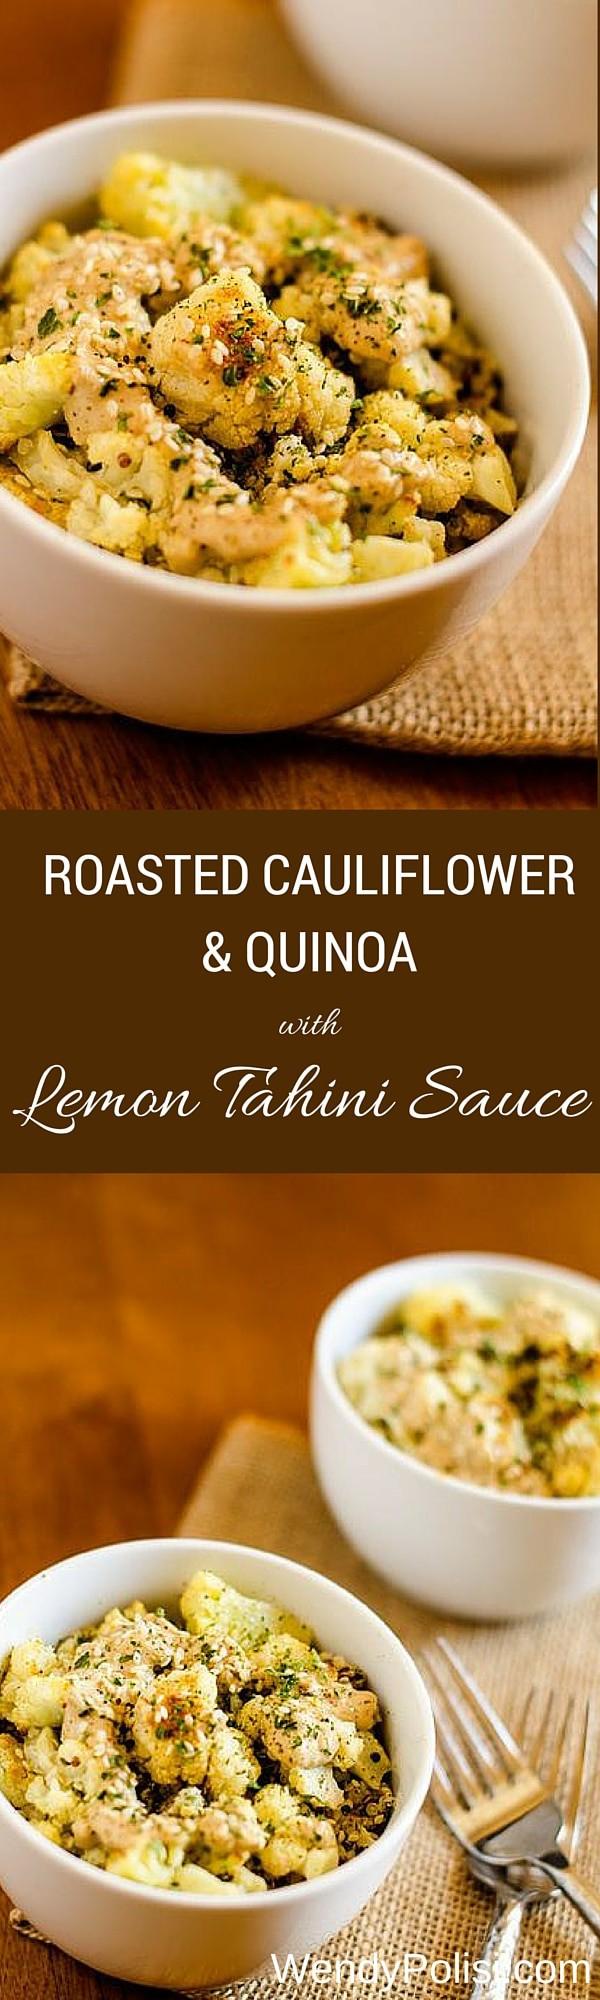 roasted-cauliflower-quinoa